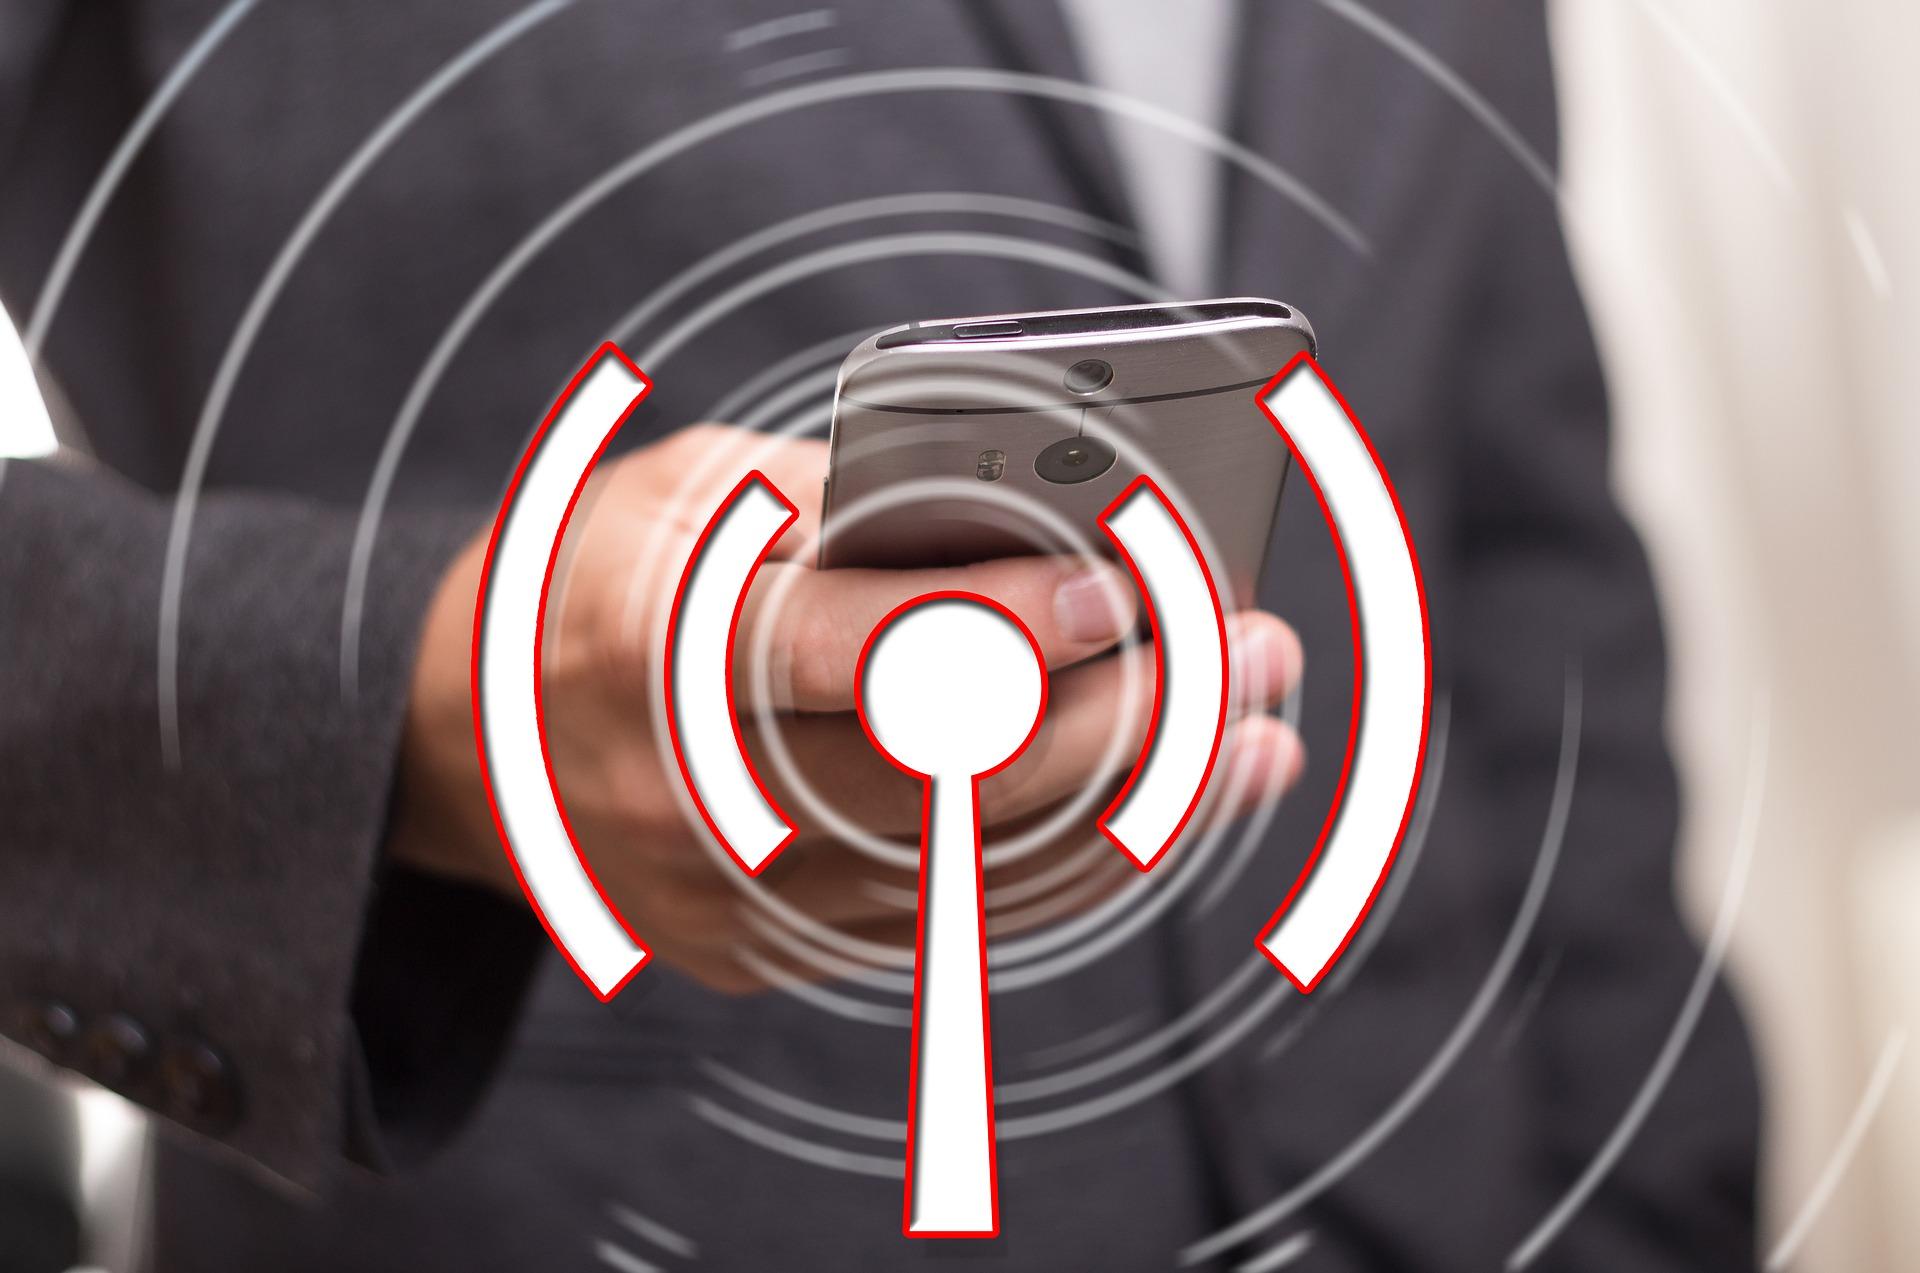 Phone-wlan-wifi-mobile-phone-call